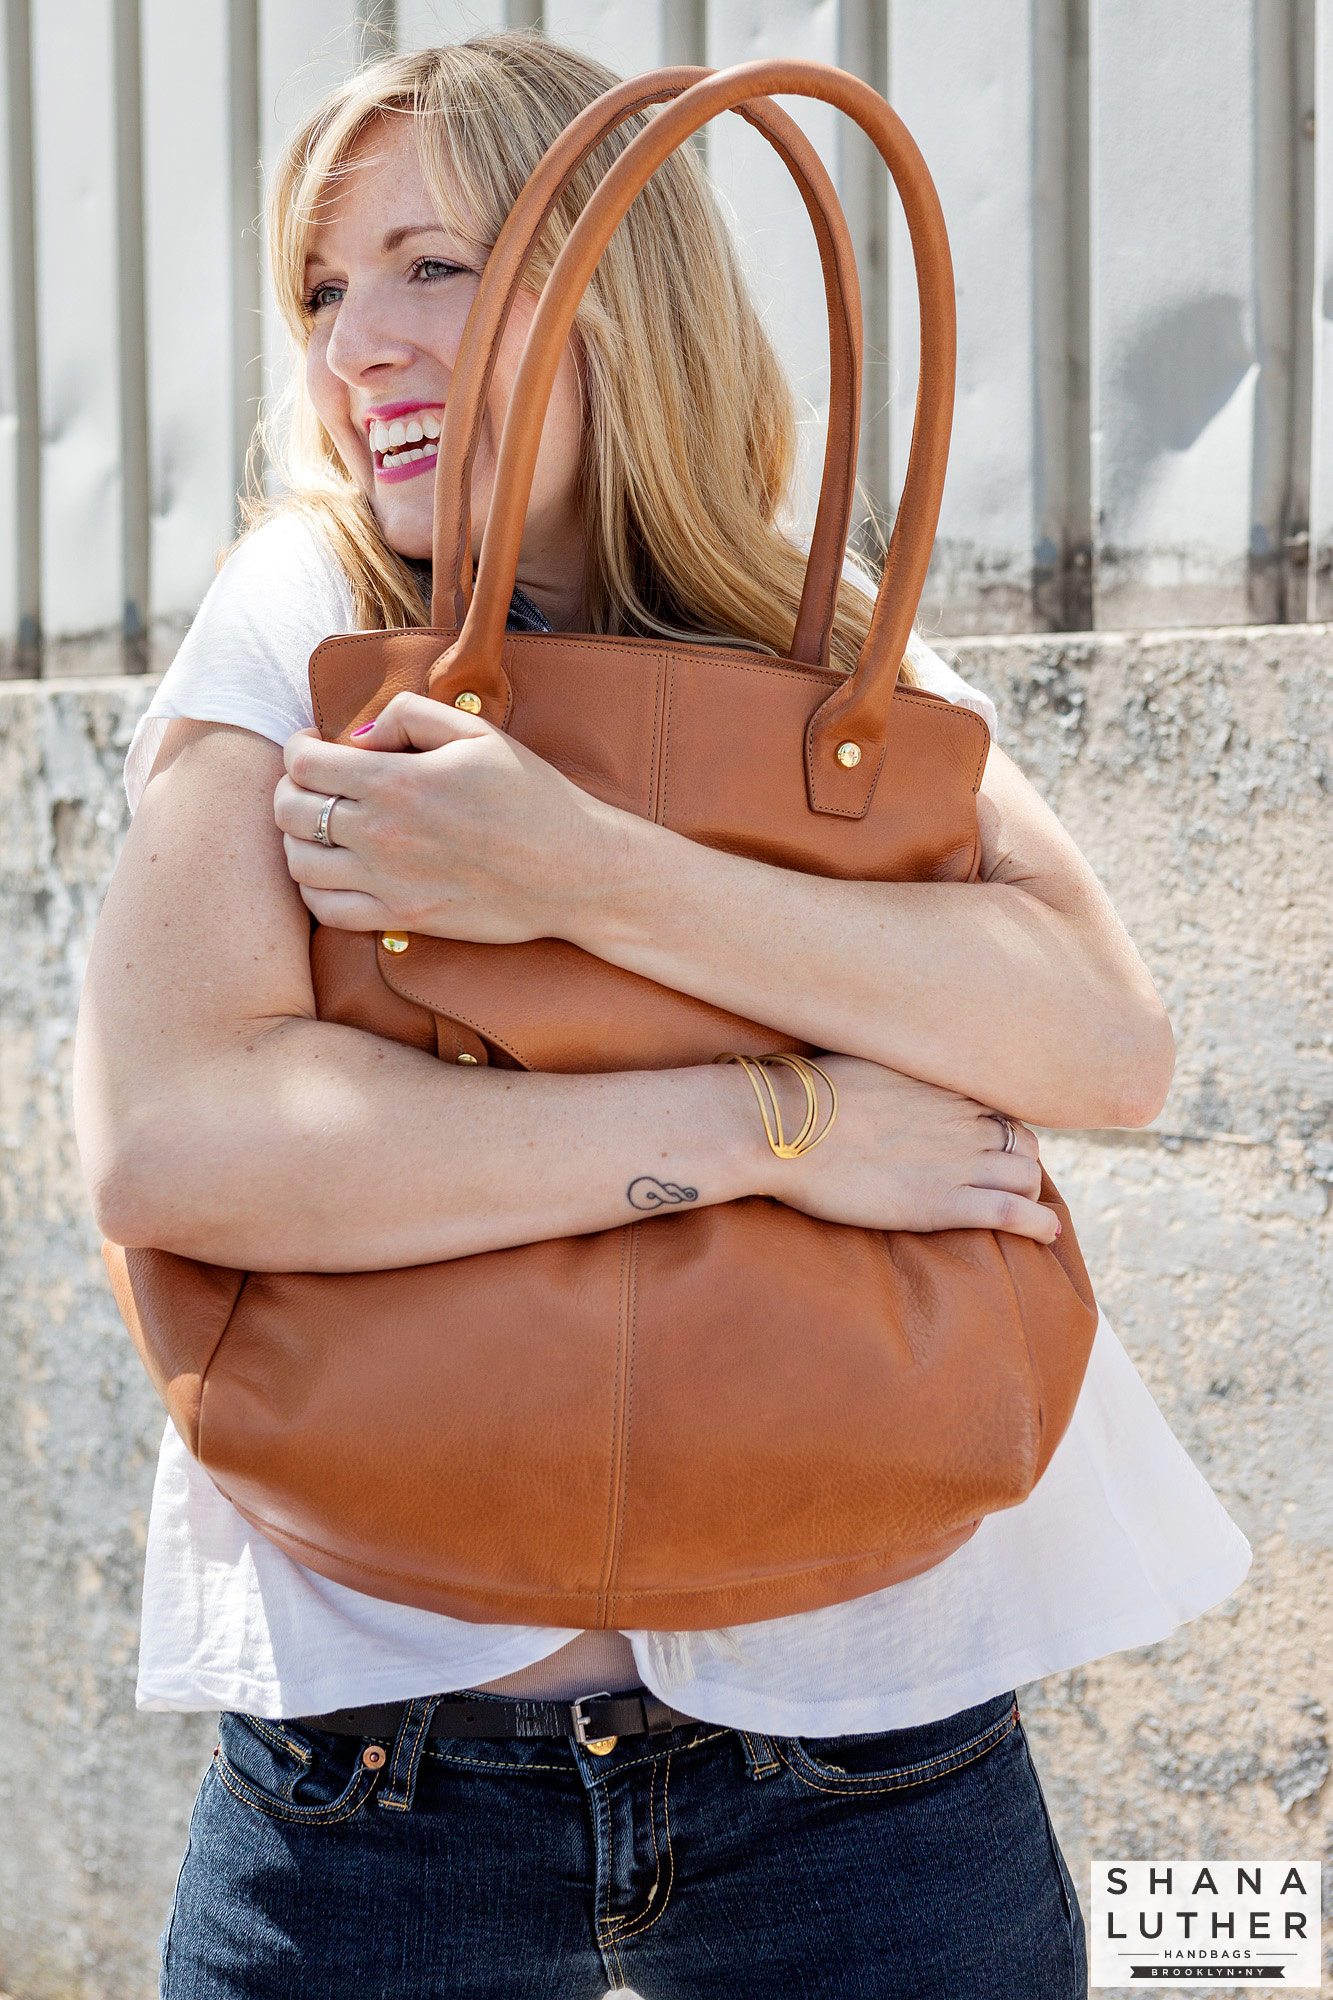 Carey_Kirkella_fashion_120512_shana_handbags_5772.jpg